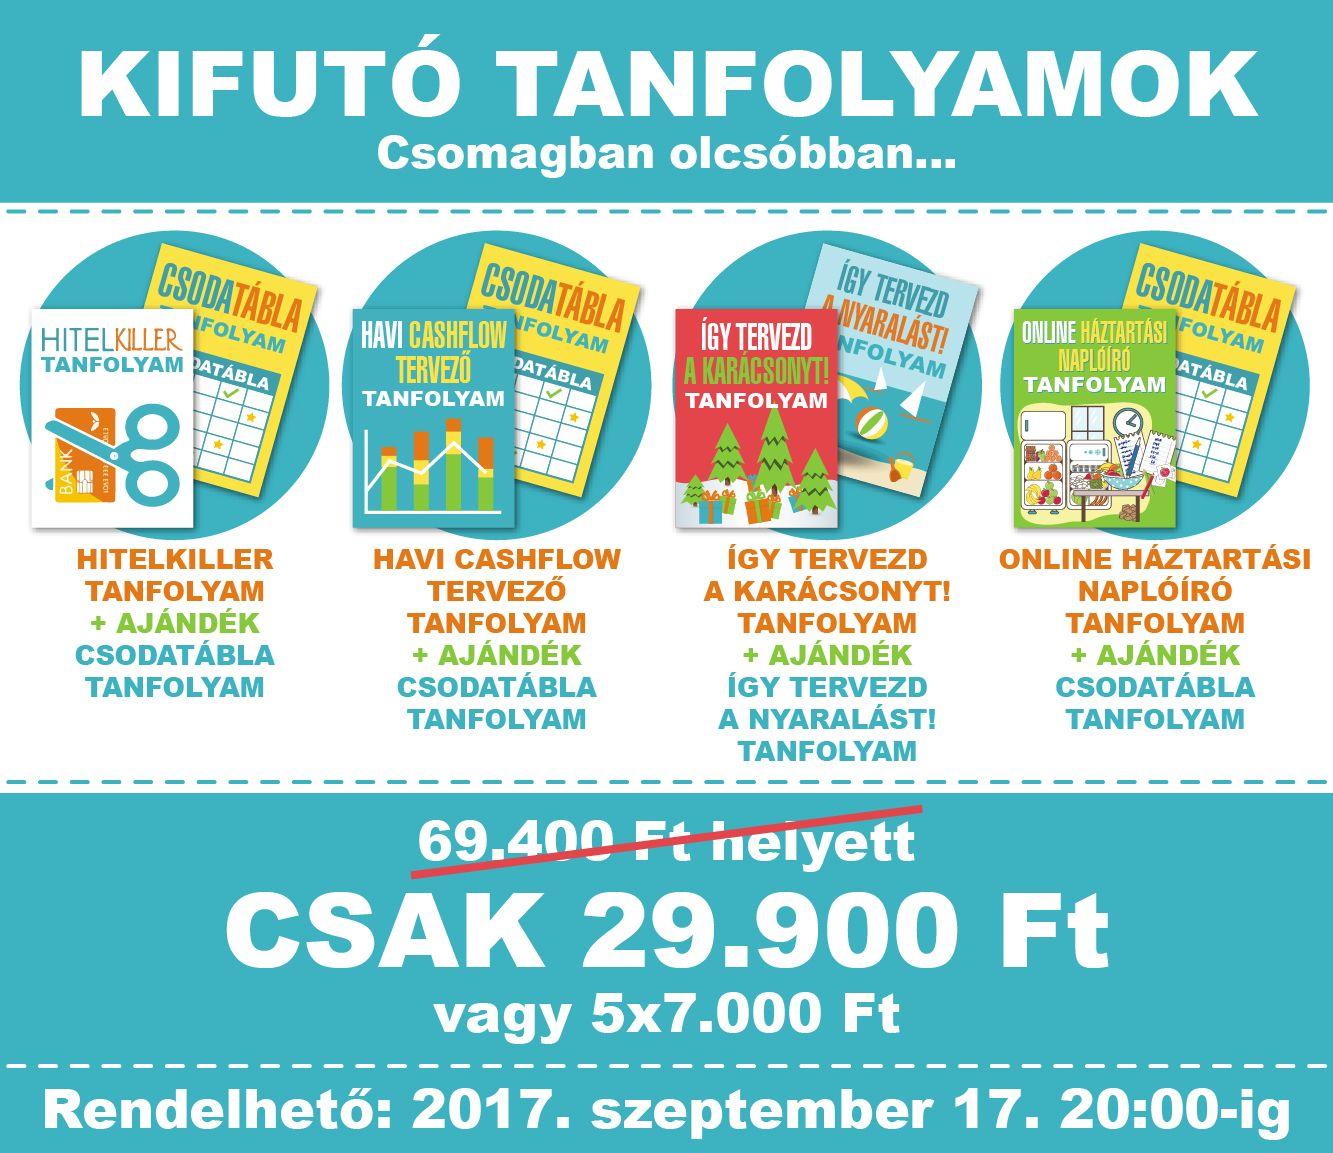 kifut%C3%B3-tanfolyamok-bannerei_p%C3%A1